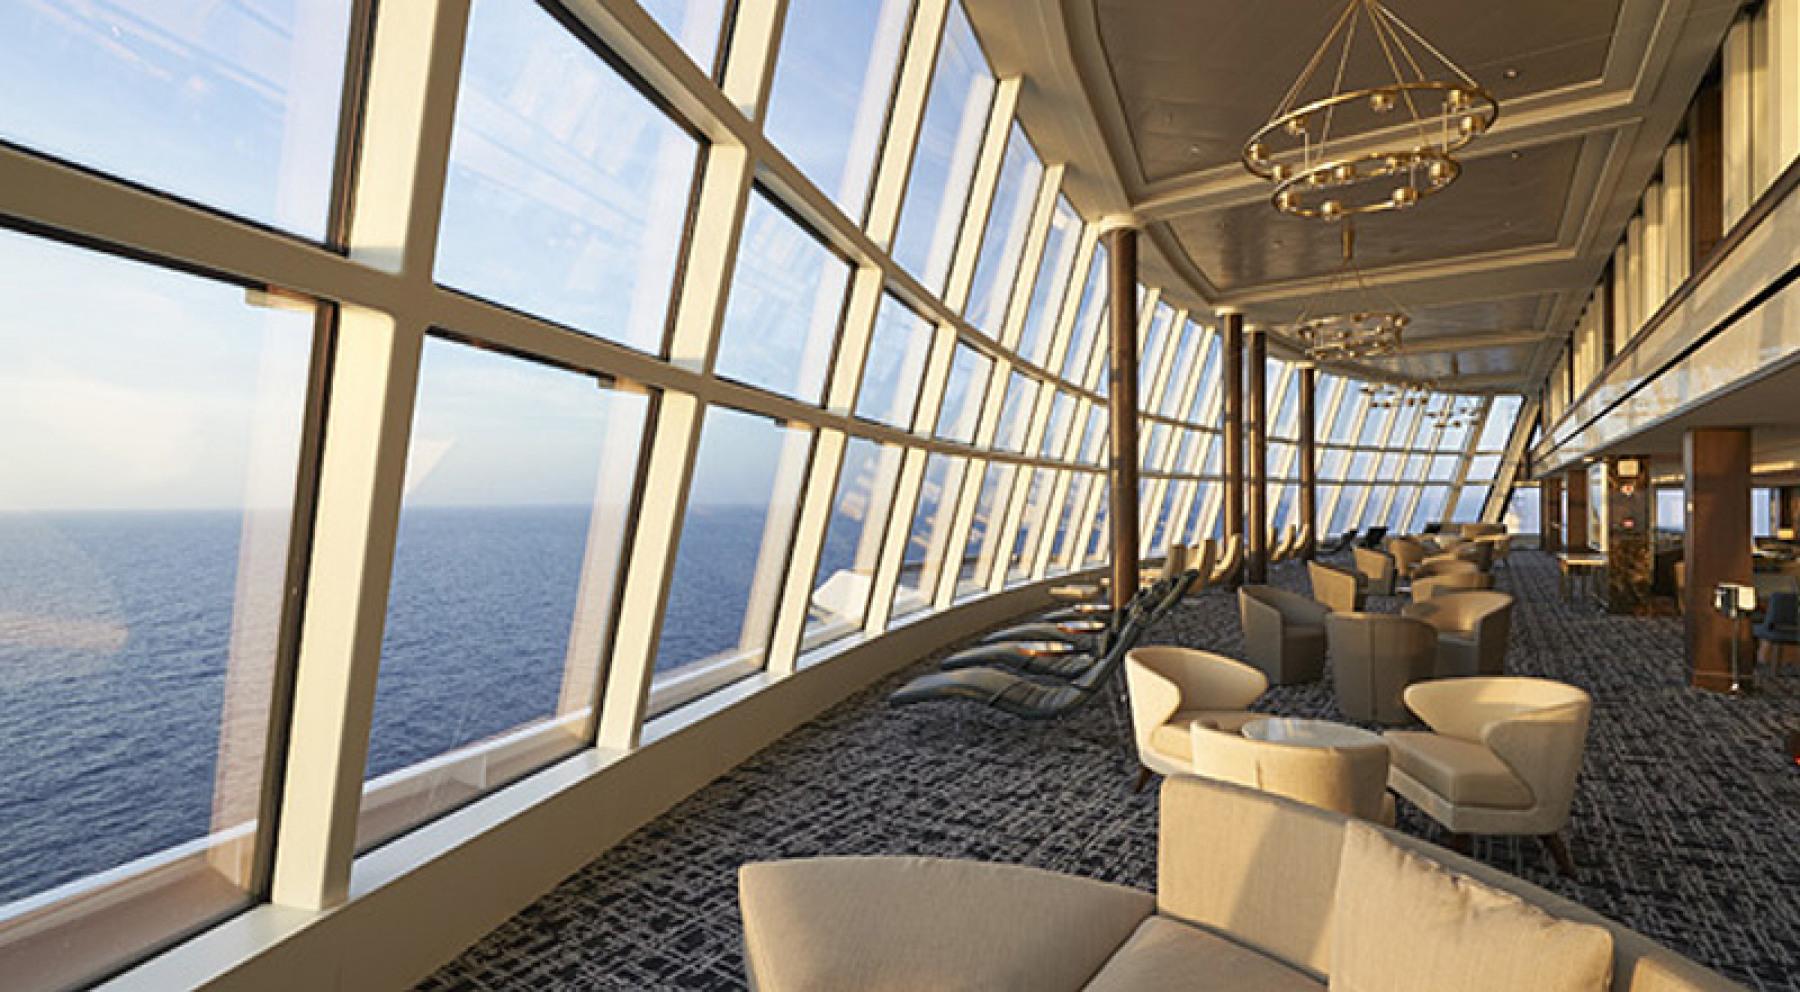 Norwegian Cruise Lines Norwegian Joy Interior Concierge Lounge.jpg